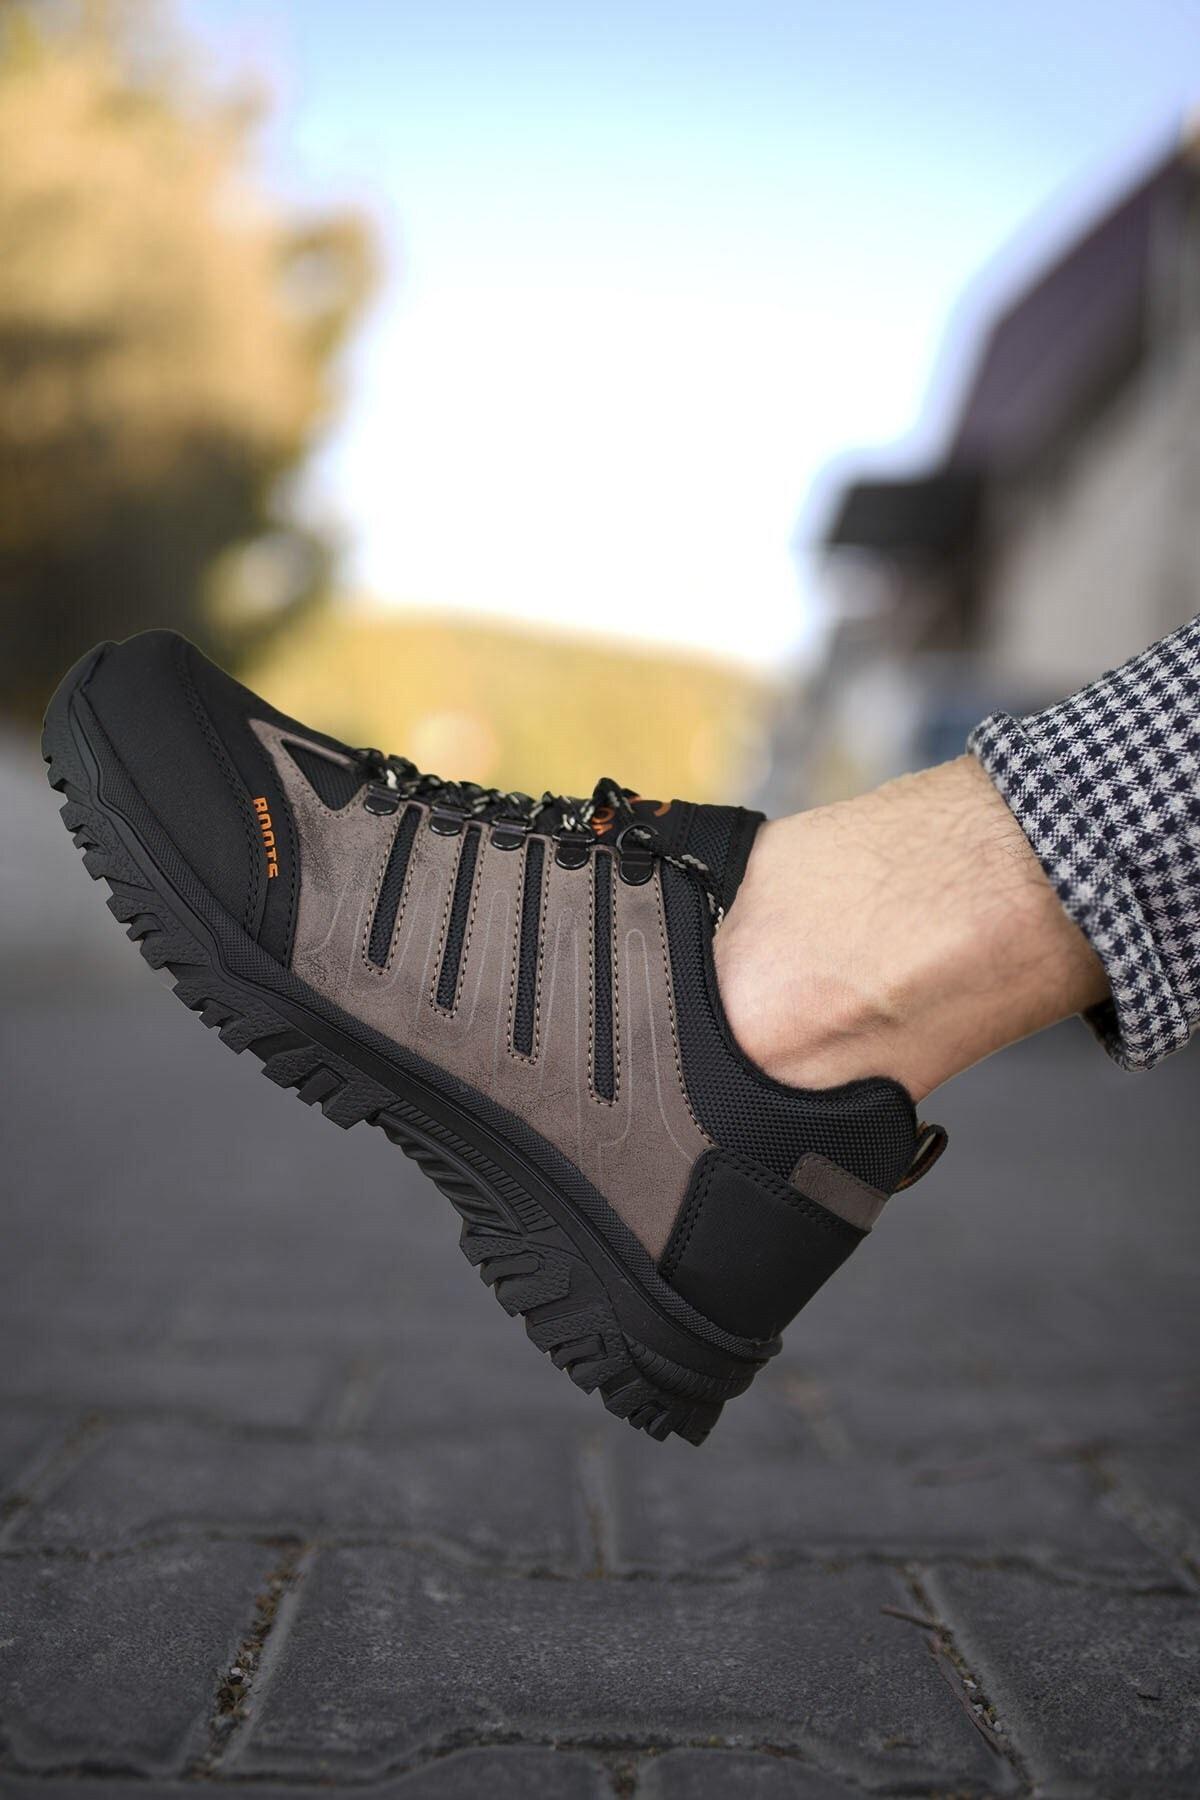 Riccon Kahverengi Siyah Erkek Trekking Ayakkabı 0012115 1